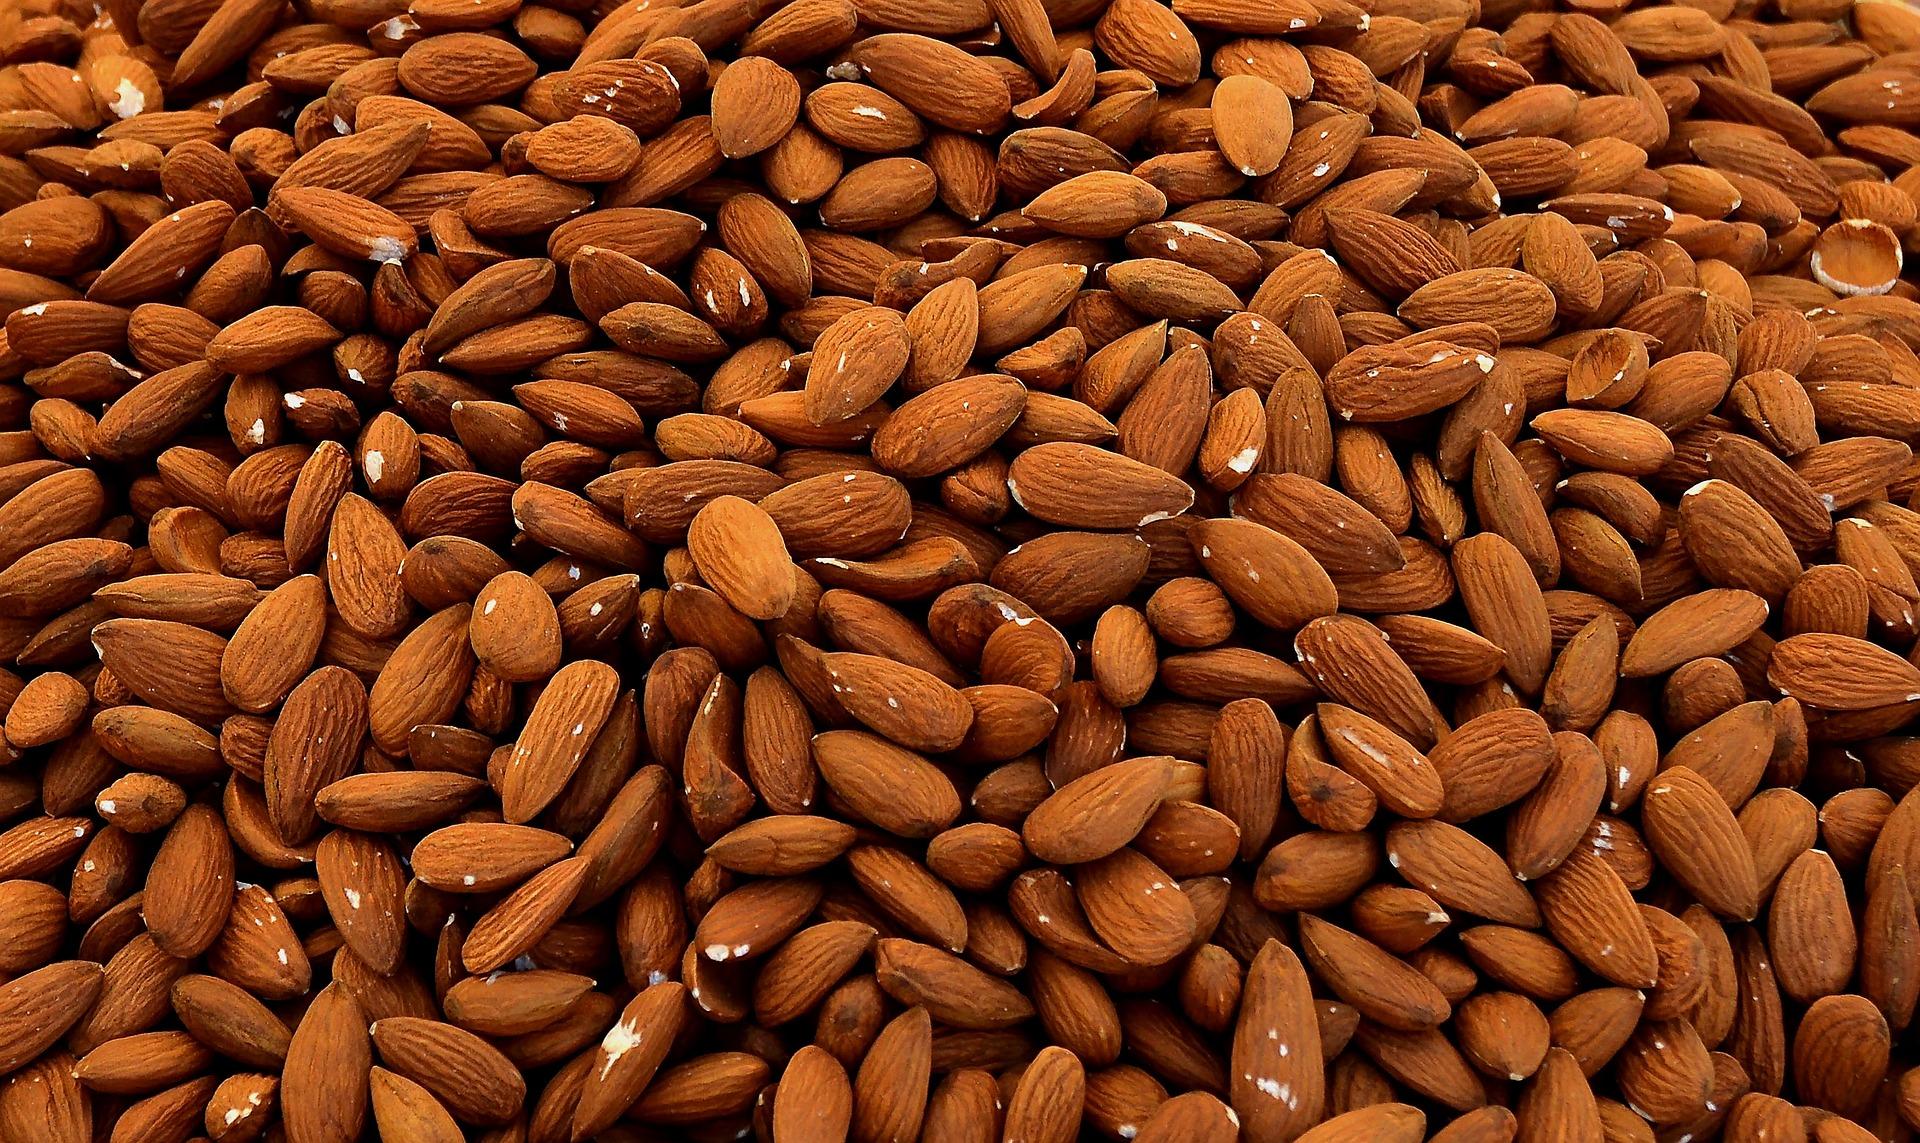 Vast fields of almonds